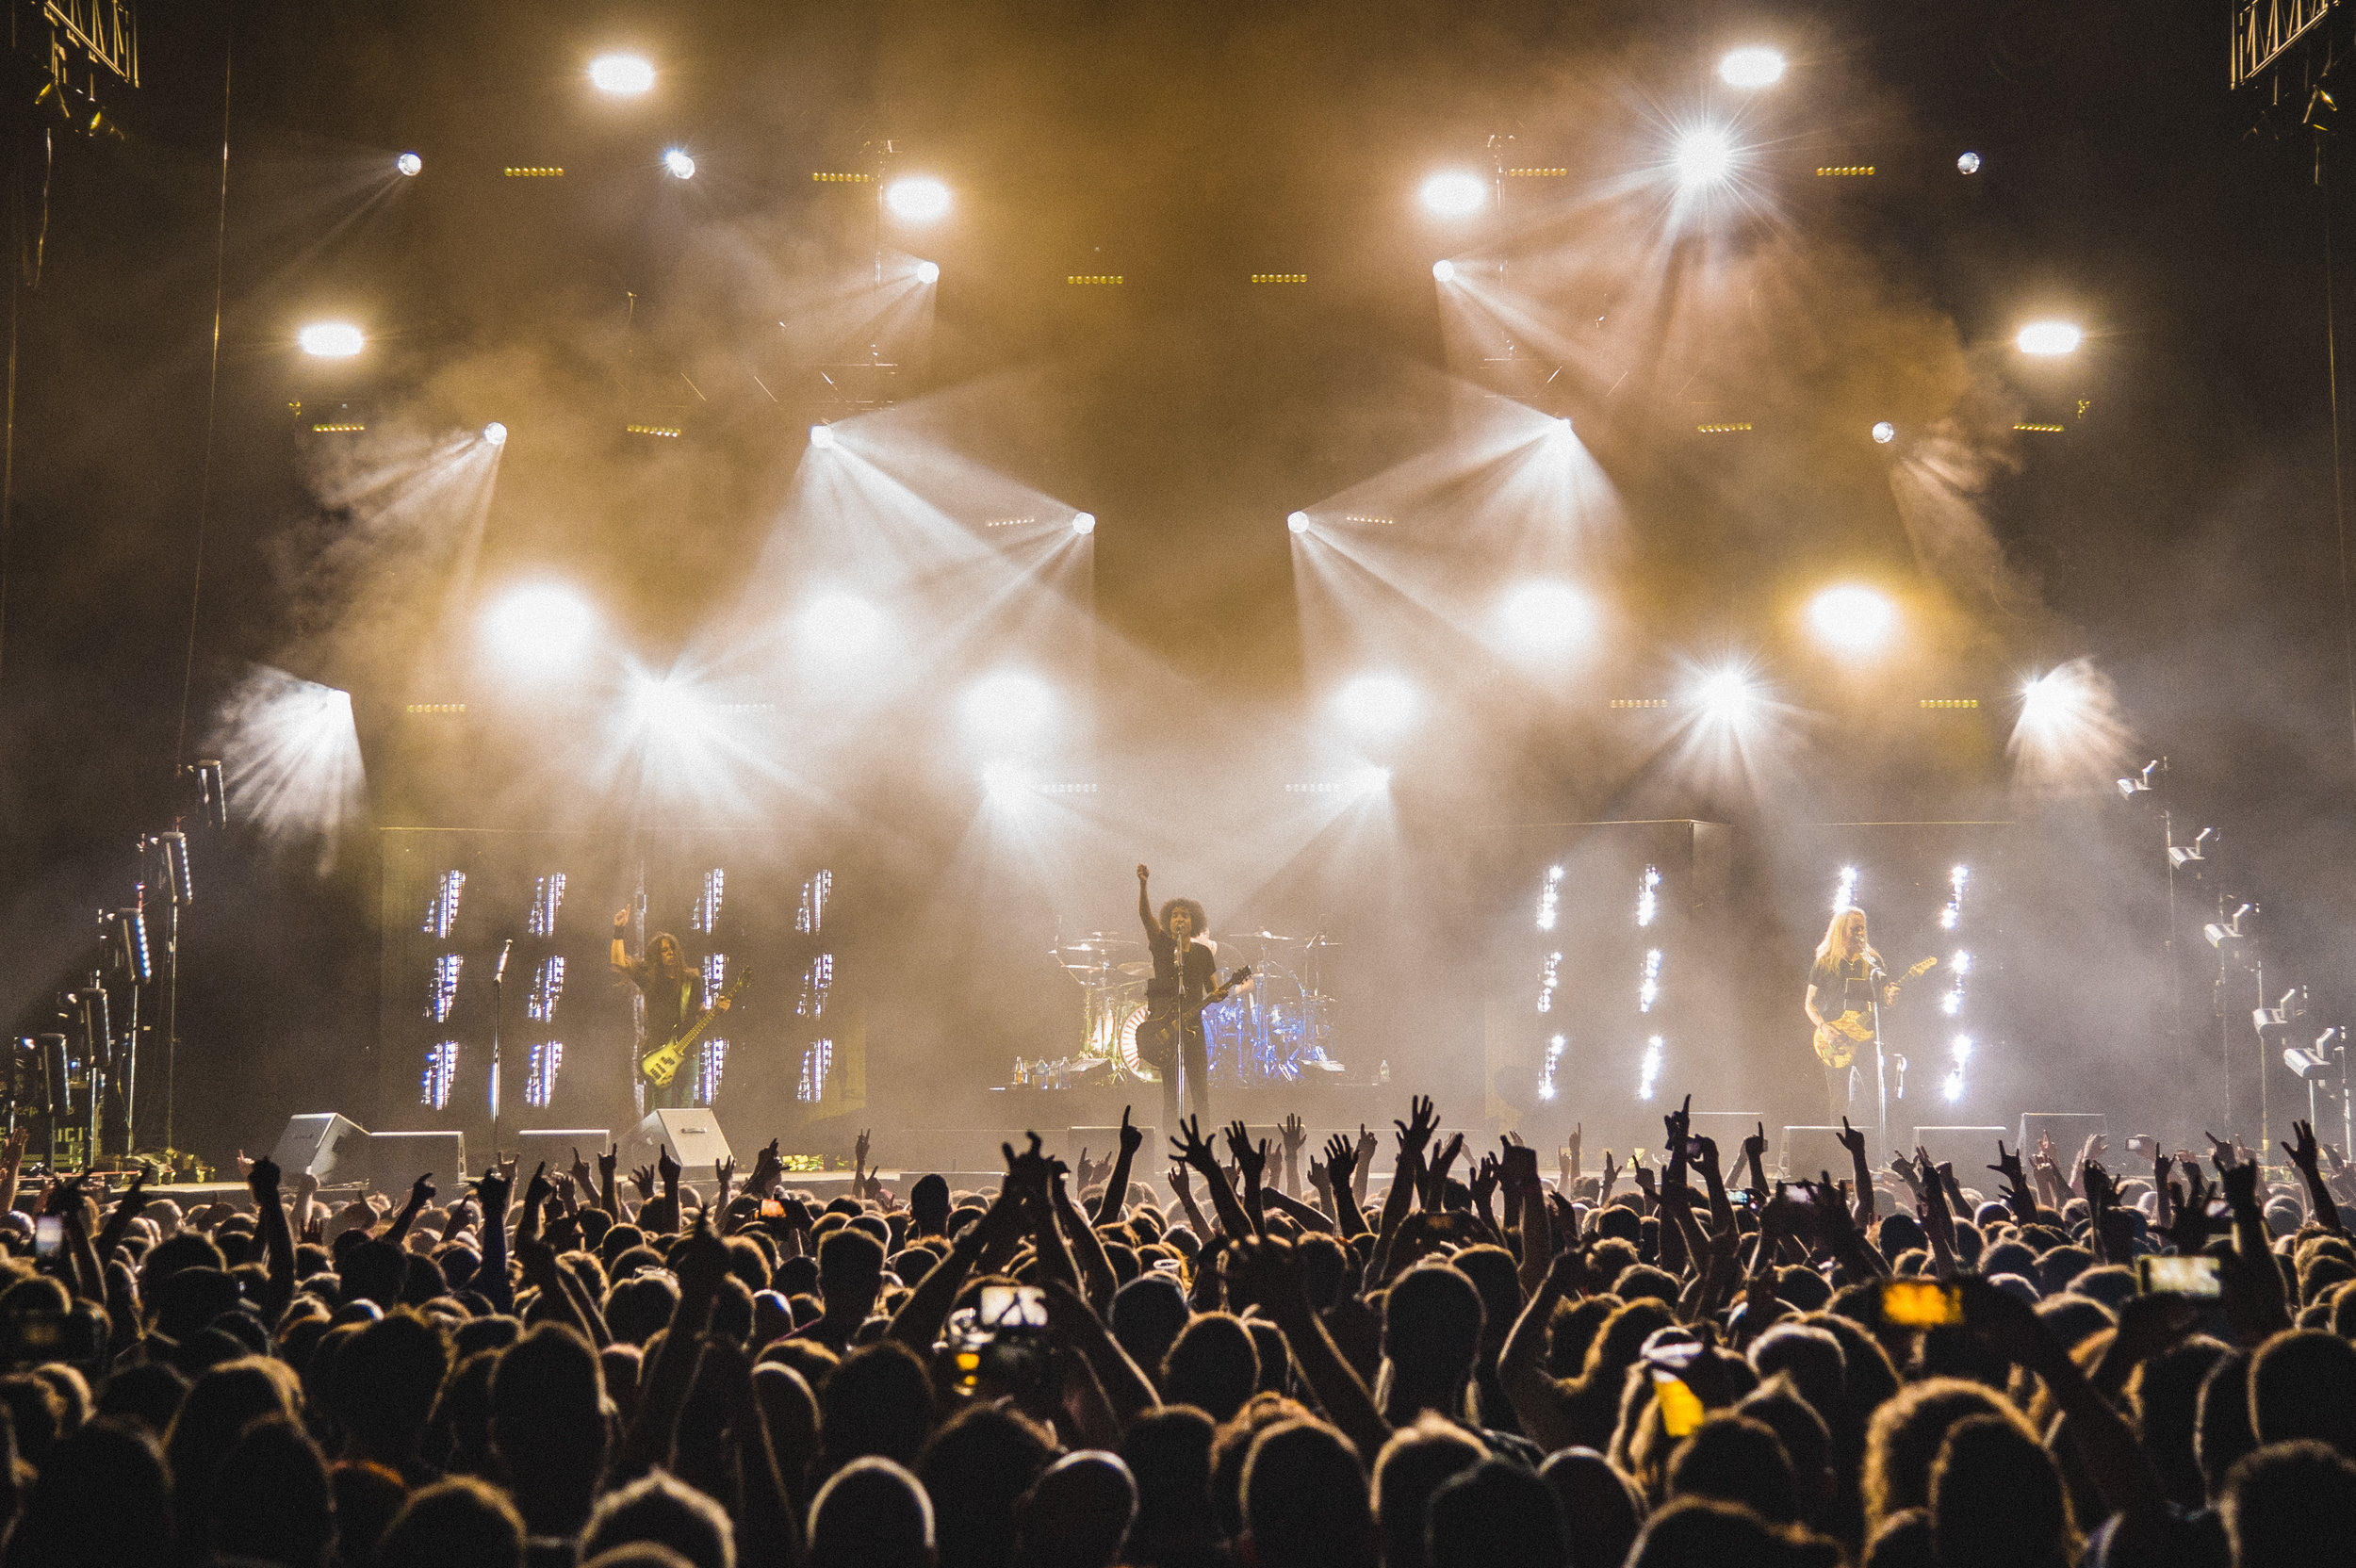 Alice in Chains  Rainier Fog Tour - Wembley Arena - London  2019